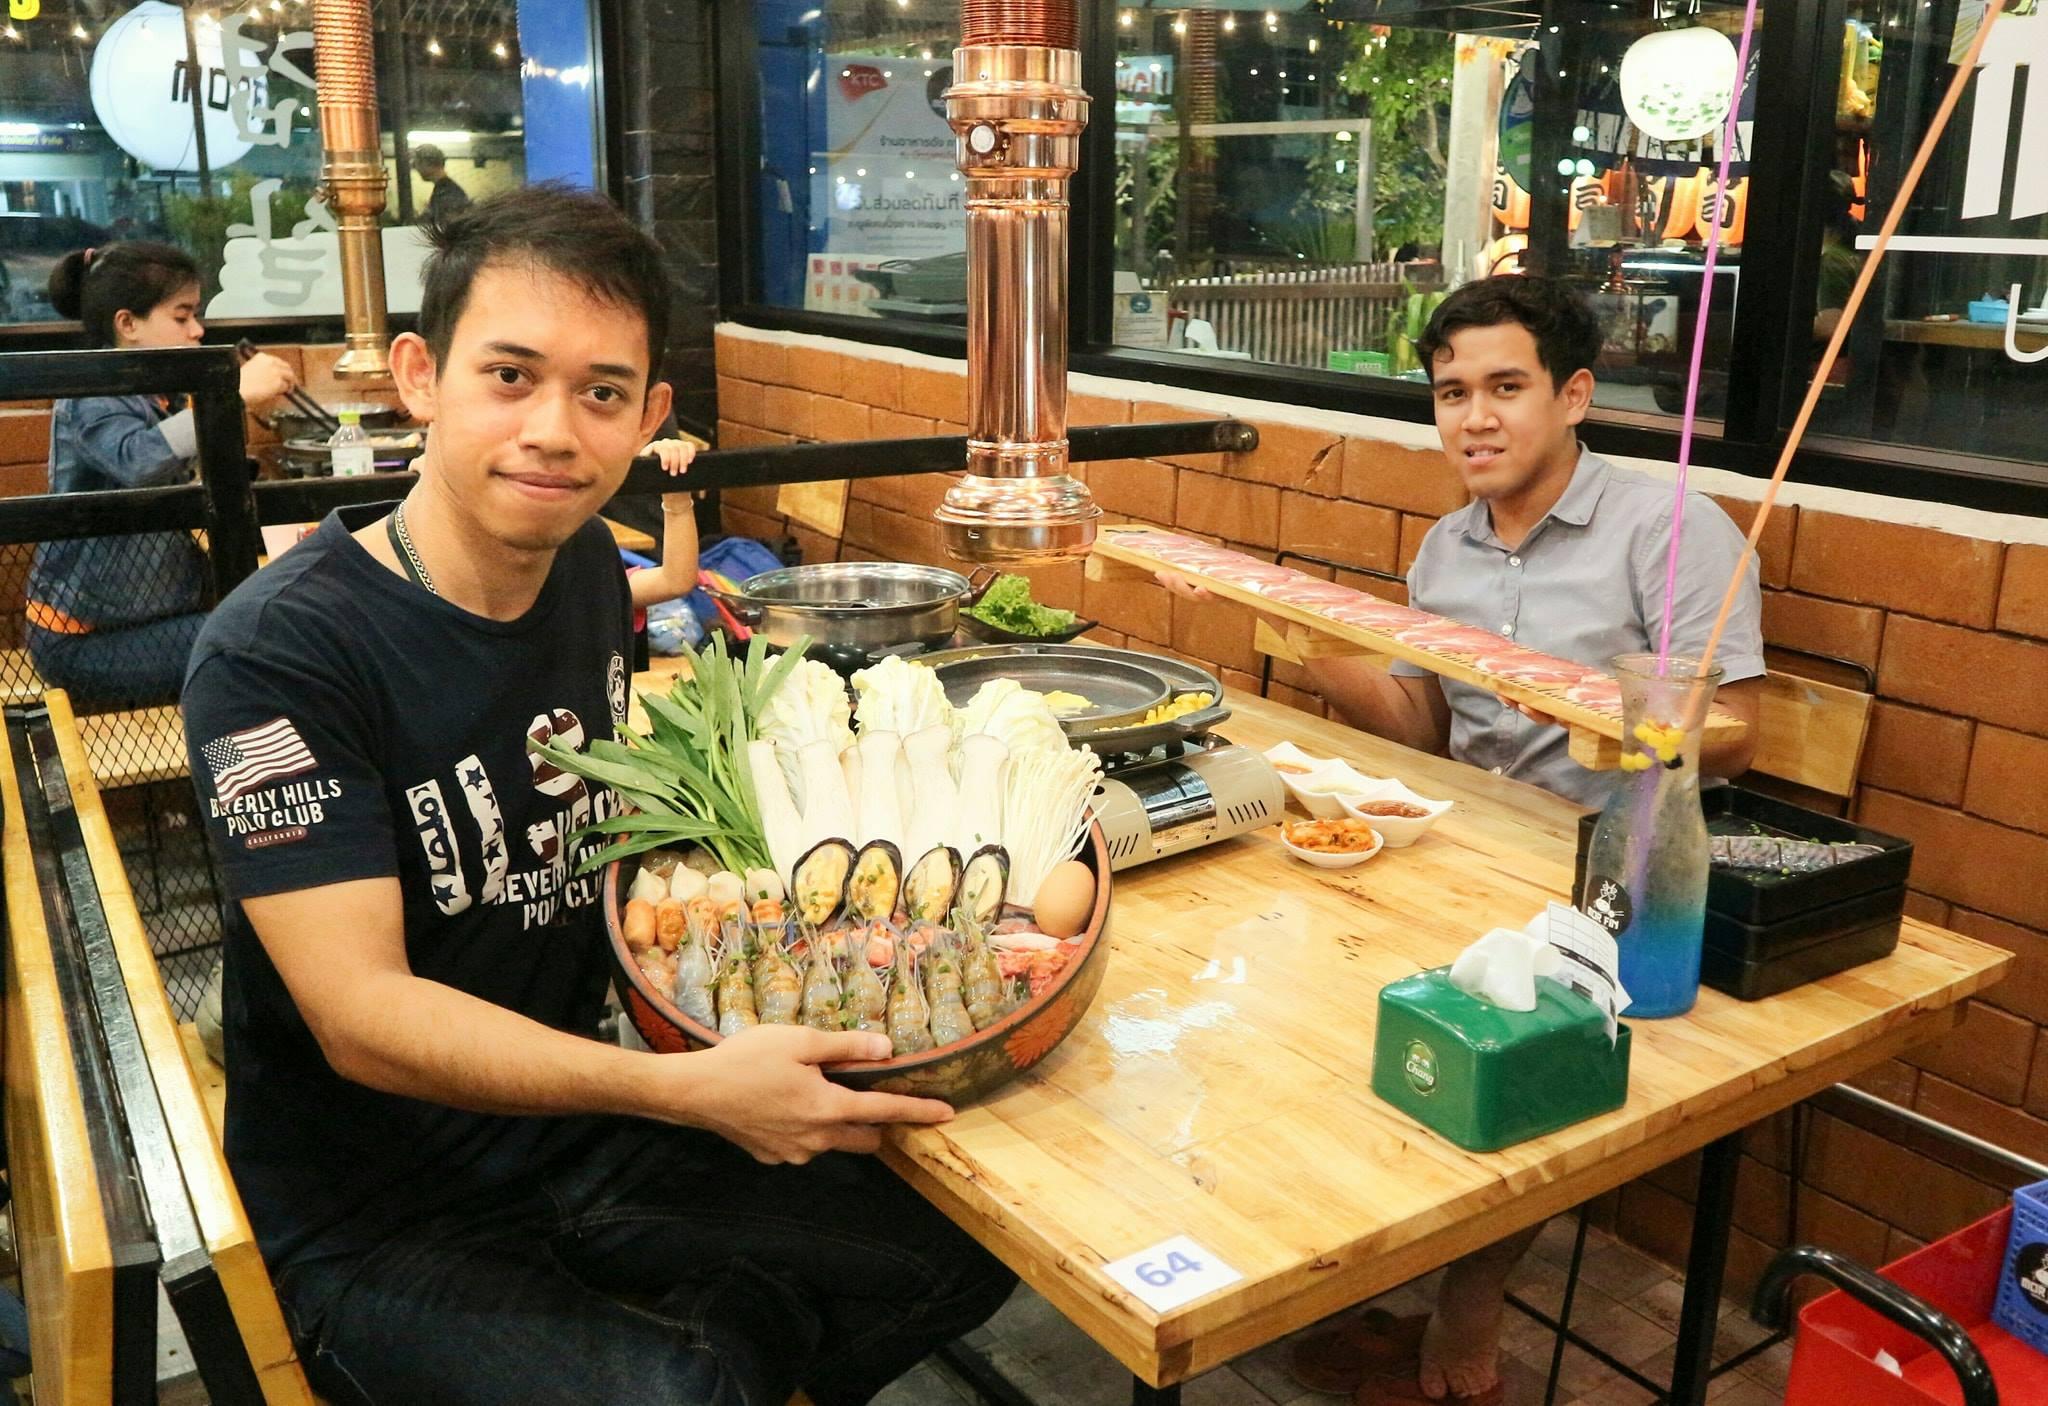 3.-Morfin-Shabu---Grill-ในเมืองหลังแมคโดนัล ร้านนี้เรียกได้ว่าครบทุกอย่างจะปิ้งย่างชาบูอาหารญี่ปุ่นของหวานเครื่องดื่ม-มีครบหมดห้องแอร์นั่งสบายๆ-ได้ทั้งเตาปิ้งย่างชาบูในราคาแค่-199-บาททั้งนั้นบุฟเฟ่ต์ไม่จำกัดเวลา-วันไหนแอดหิวๆอยากจัดบุฟเฟ่ต์ก็มาที่นี่แหละครับประหยัดดี-55- ของกิน,นครศรีธรรมราช,หาไรกิน,ของอร่อย,อาหารเด็ด,ร้านเด็ด,ร้านอาหาร,กินอะไรดี